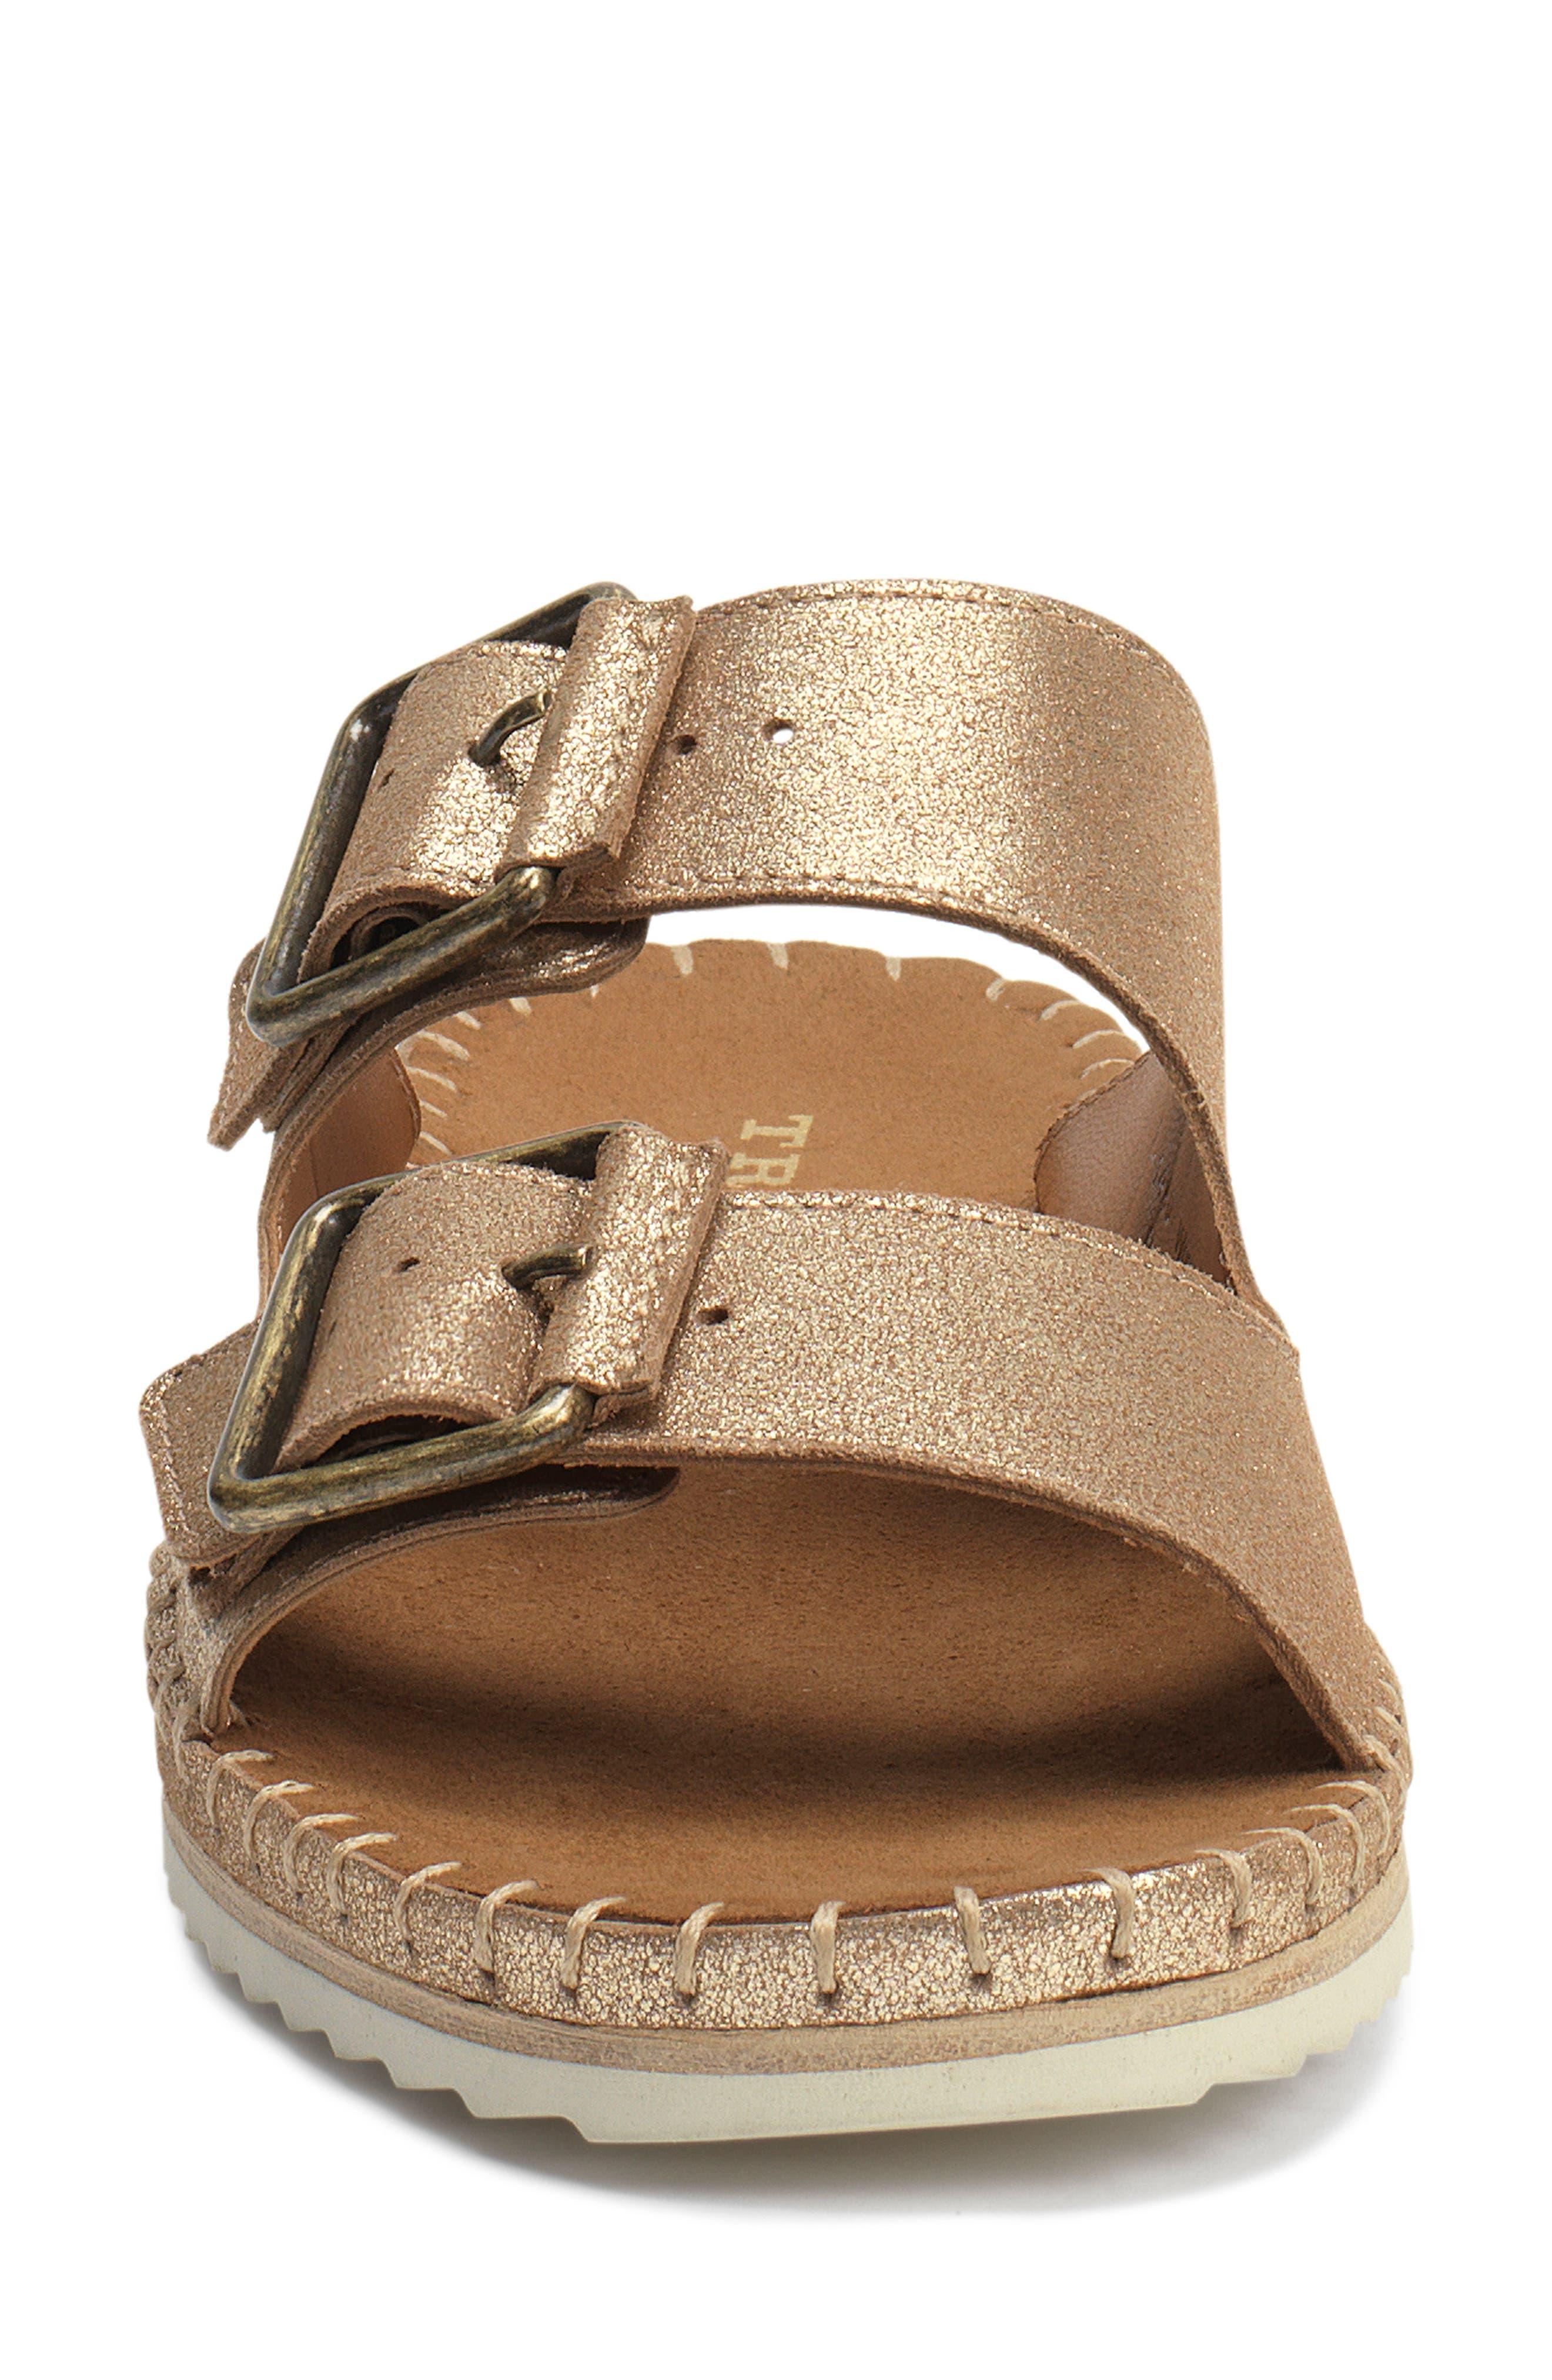 Carli Slide Sandal,                             Alternate thumbnail 4, color,                             GOLD METALLIC SUEDE